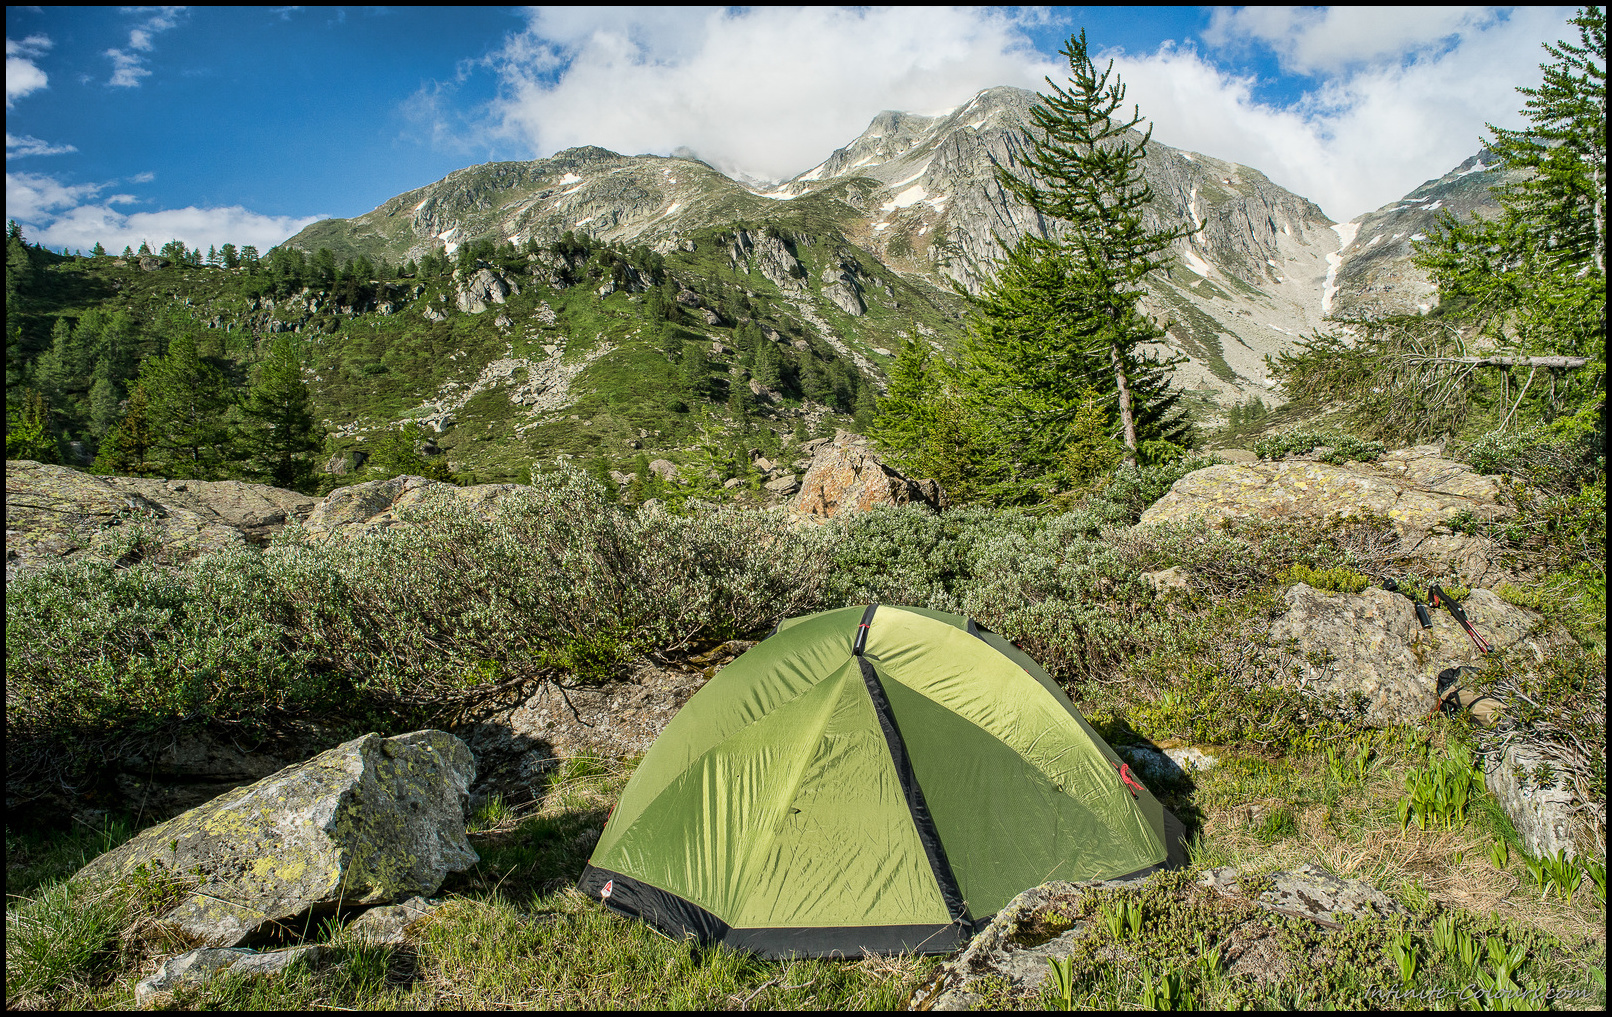 Binntal camping spot, Mässerbach